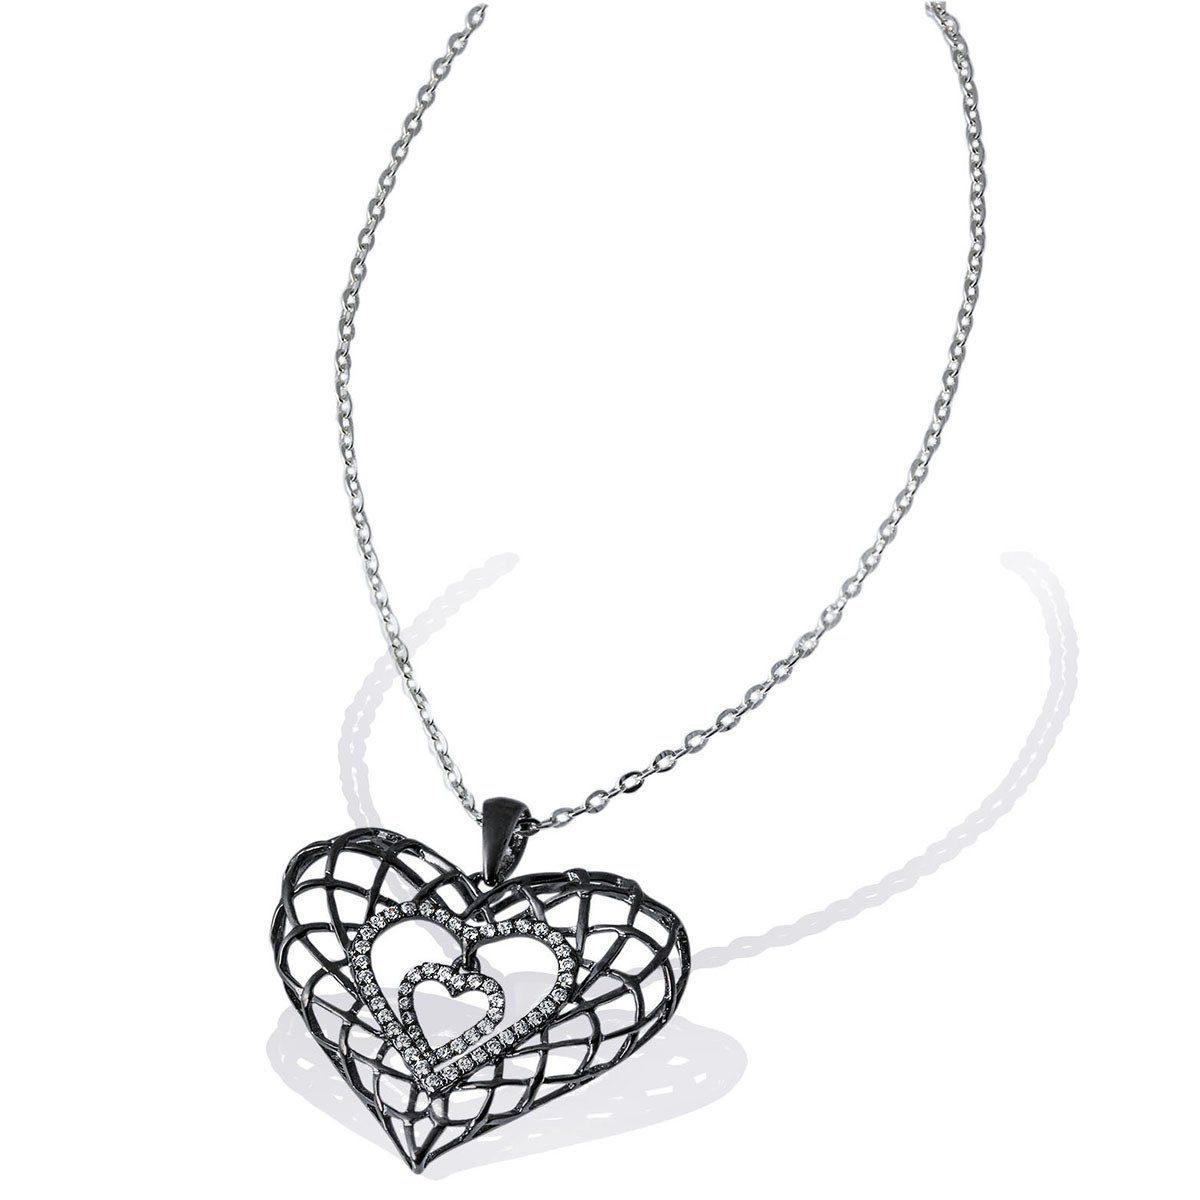 goldmaid Collier Black Heart 925 Sterlingsilber 54 weiße Zirkonia